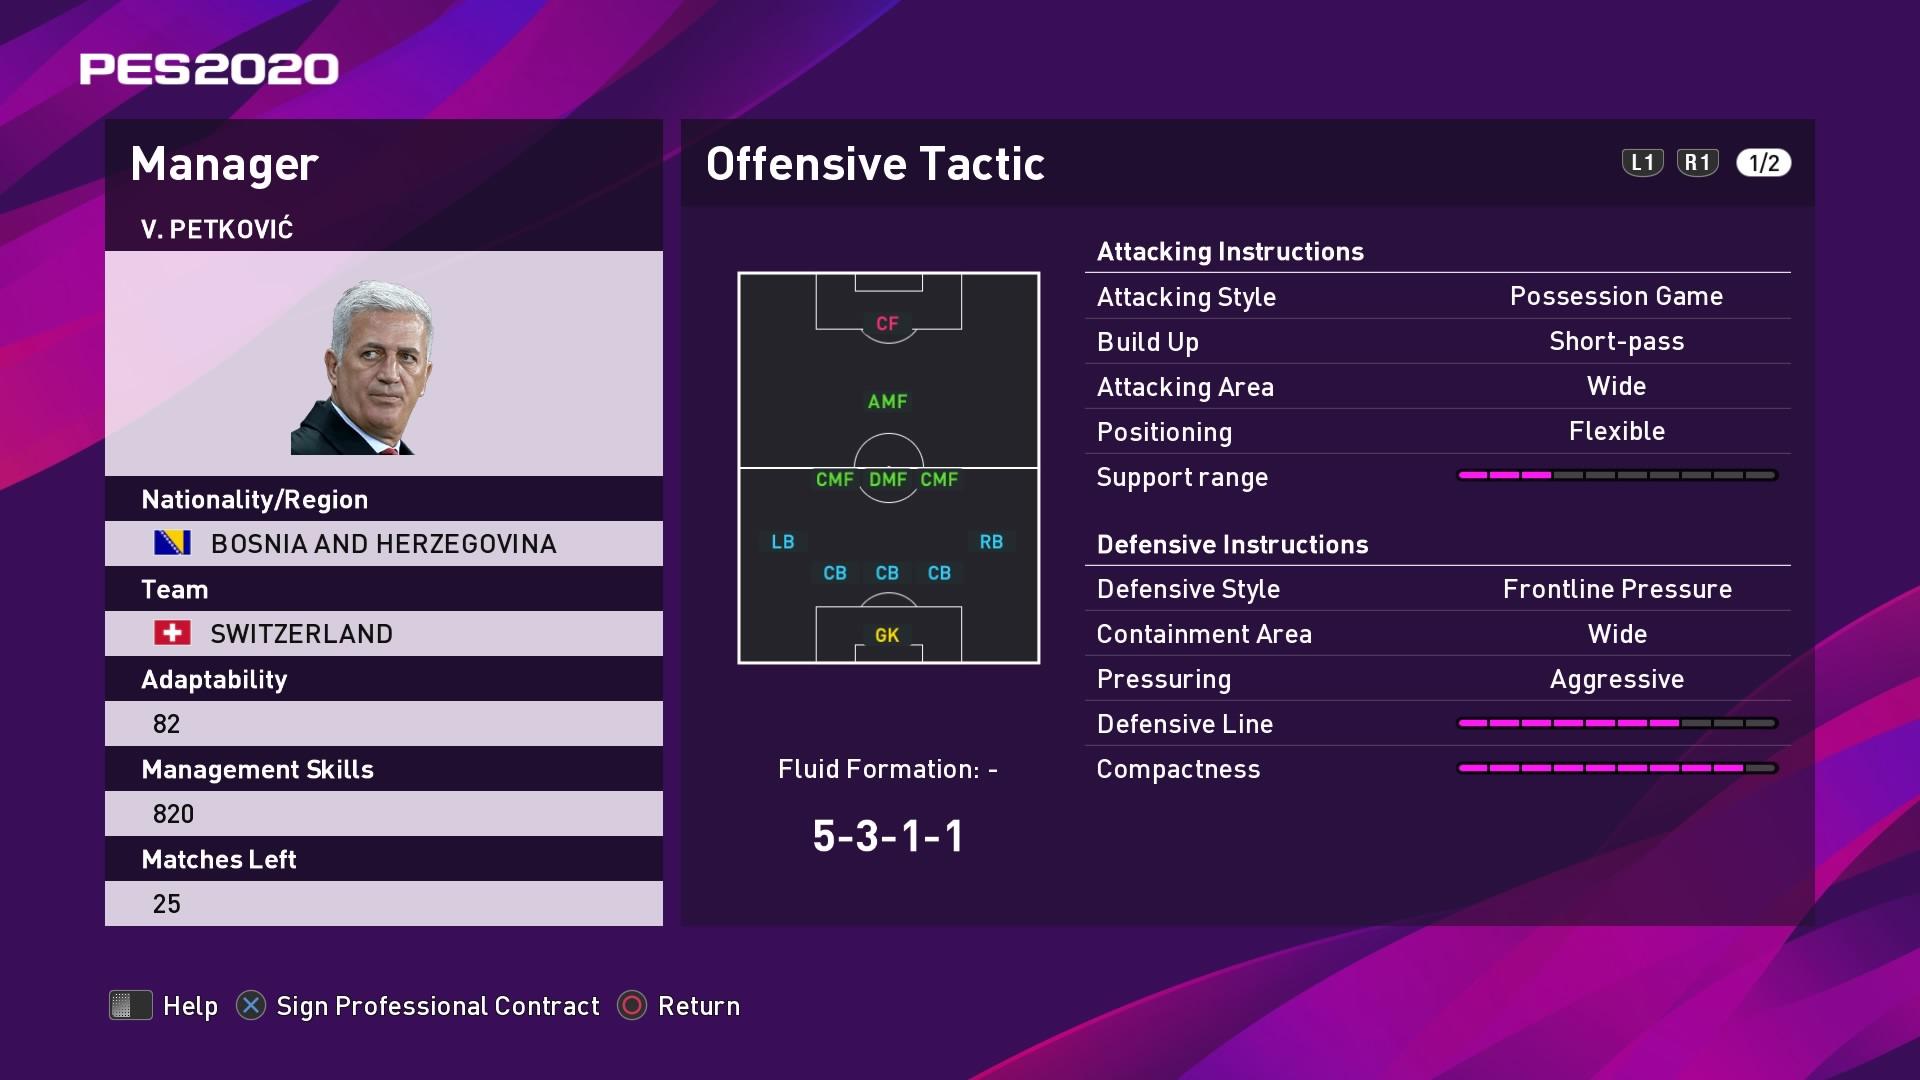 V. Petković (2) (Vladimir Petković) Offensive Tactic in PES 2020 myClub